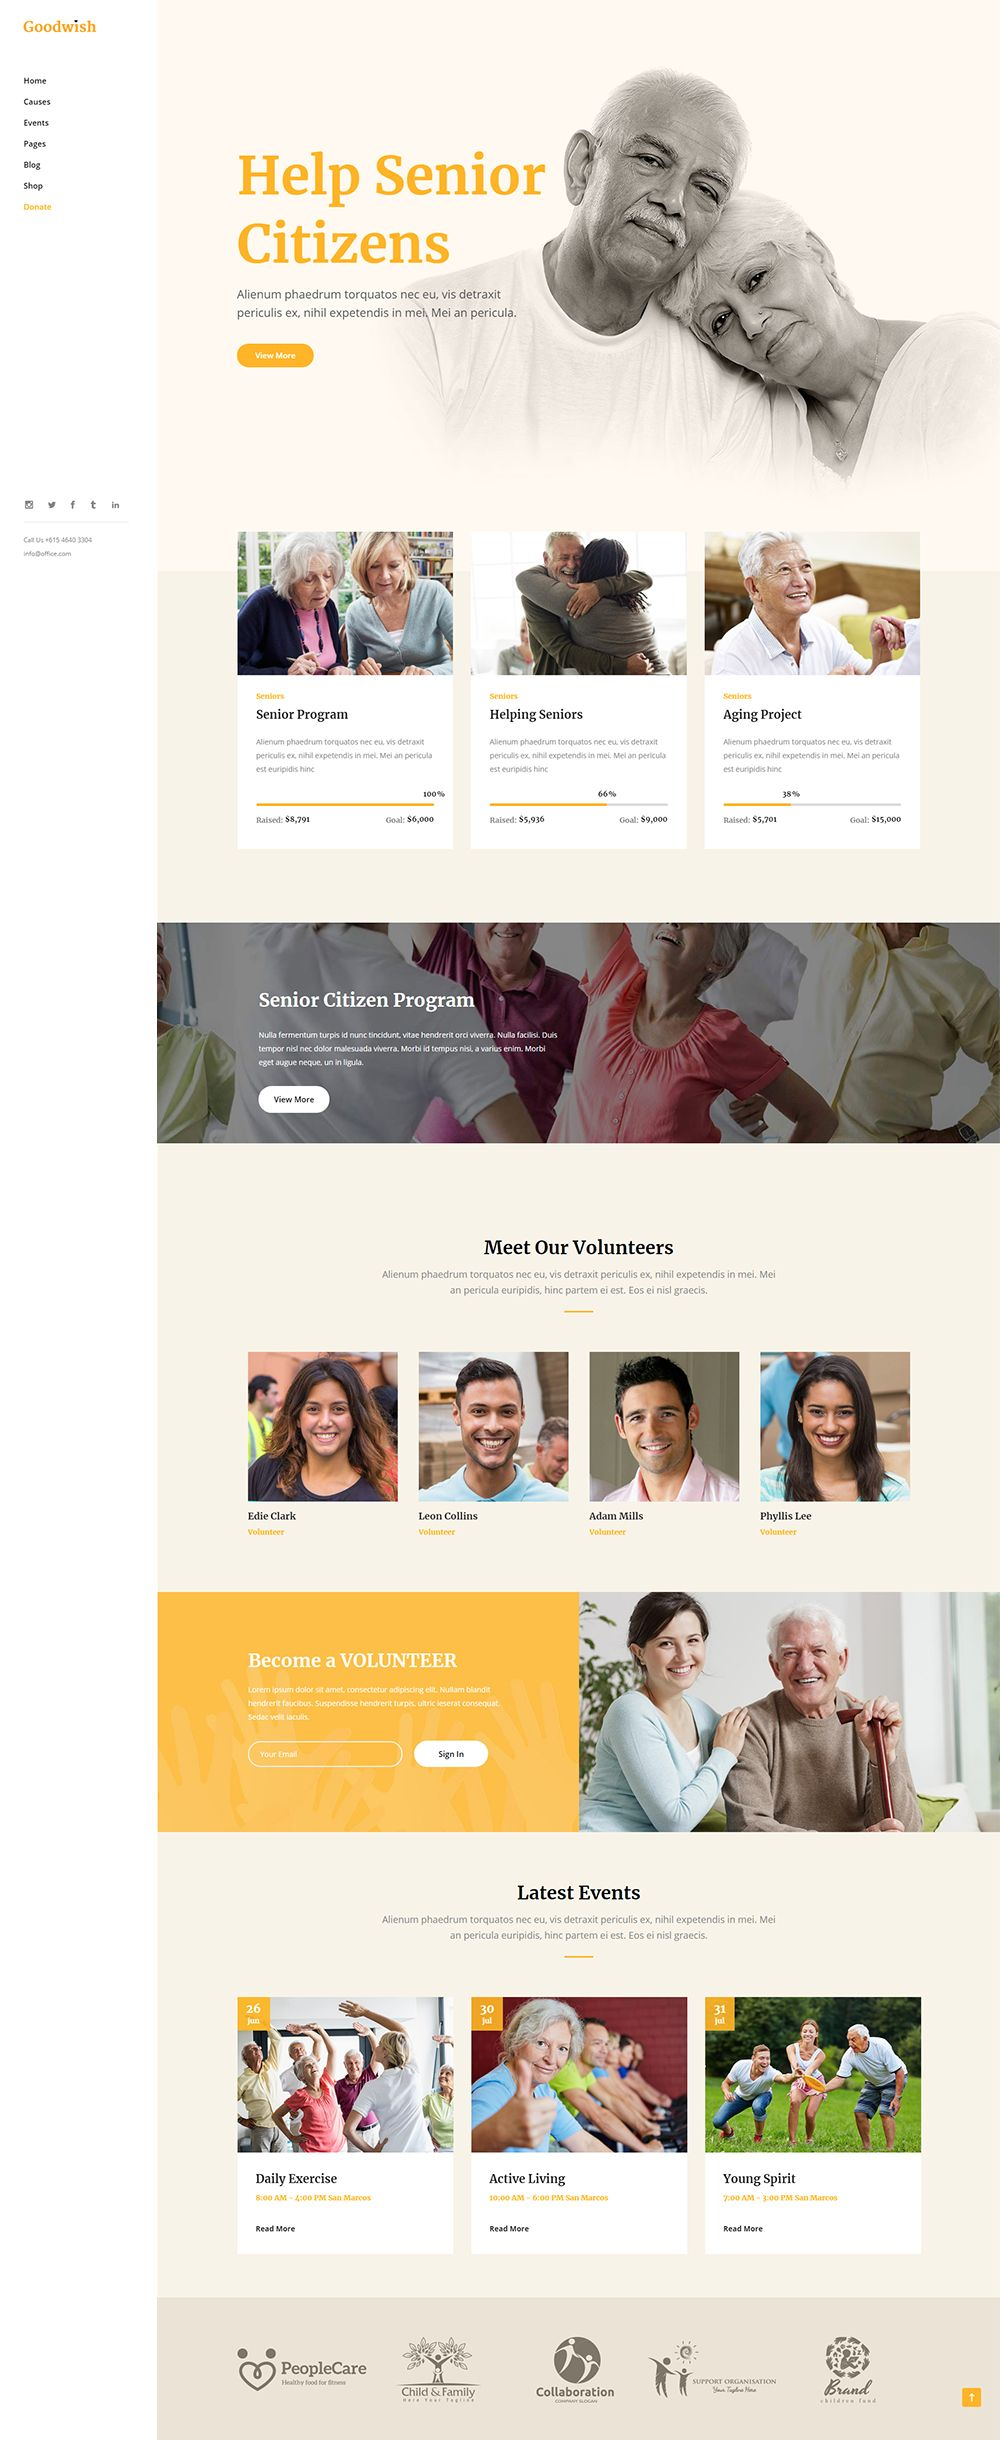 10 Of The Best Senior Care Wordpress Themes 2020 Wpklik In 2020 Nonprofit Website Design Web Design Quotes Web Design Programs